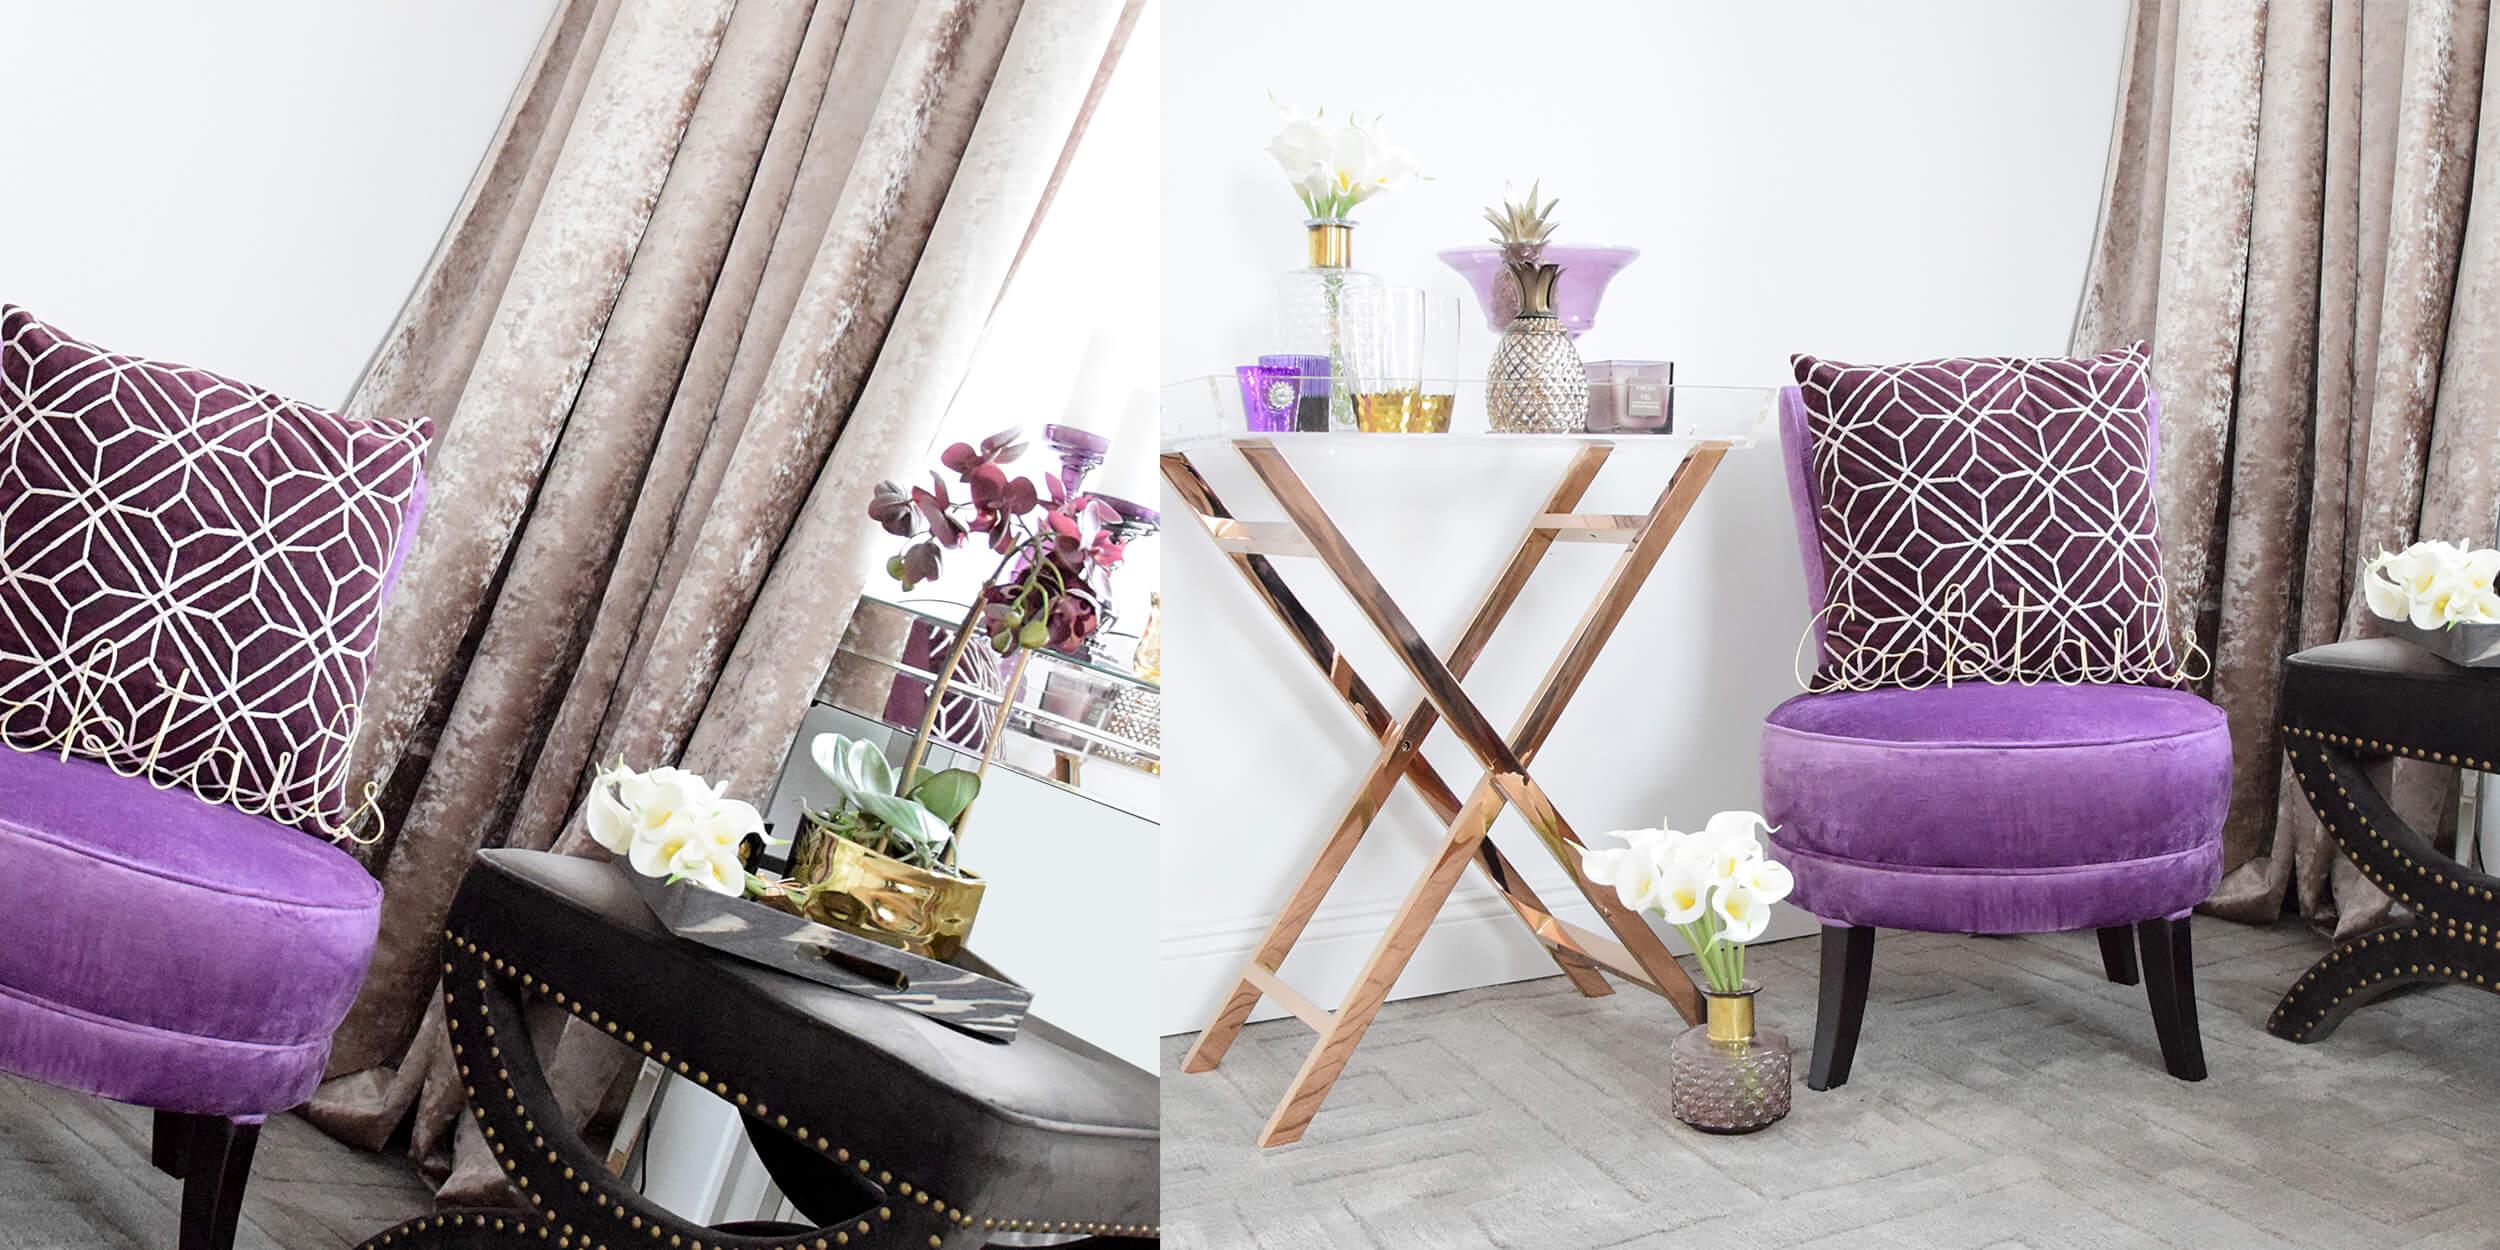 Wohnaccessoires in den Trendfarben 2018 - lila & violett